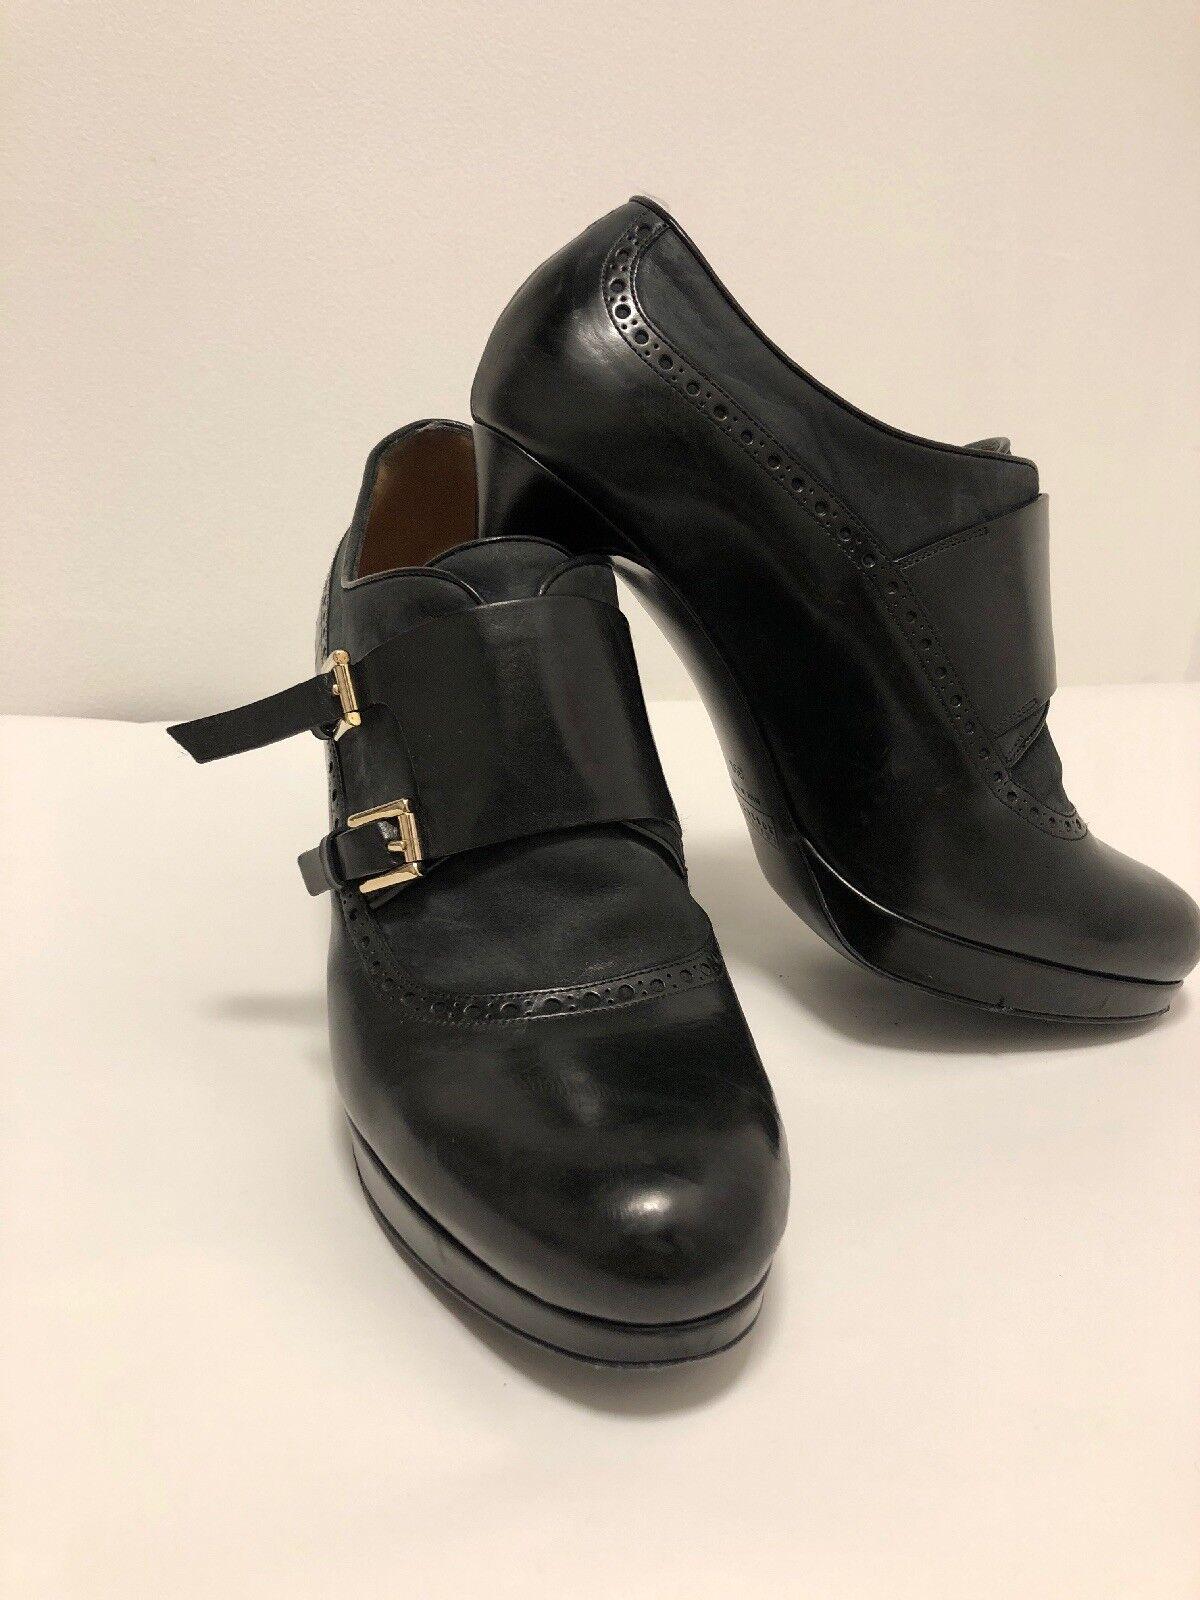 FRATELLI ROSSETTI Oxford braun Leather Heels 8.5 M M M  594a5e